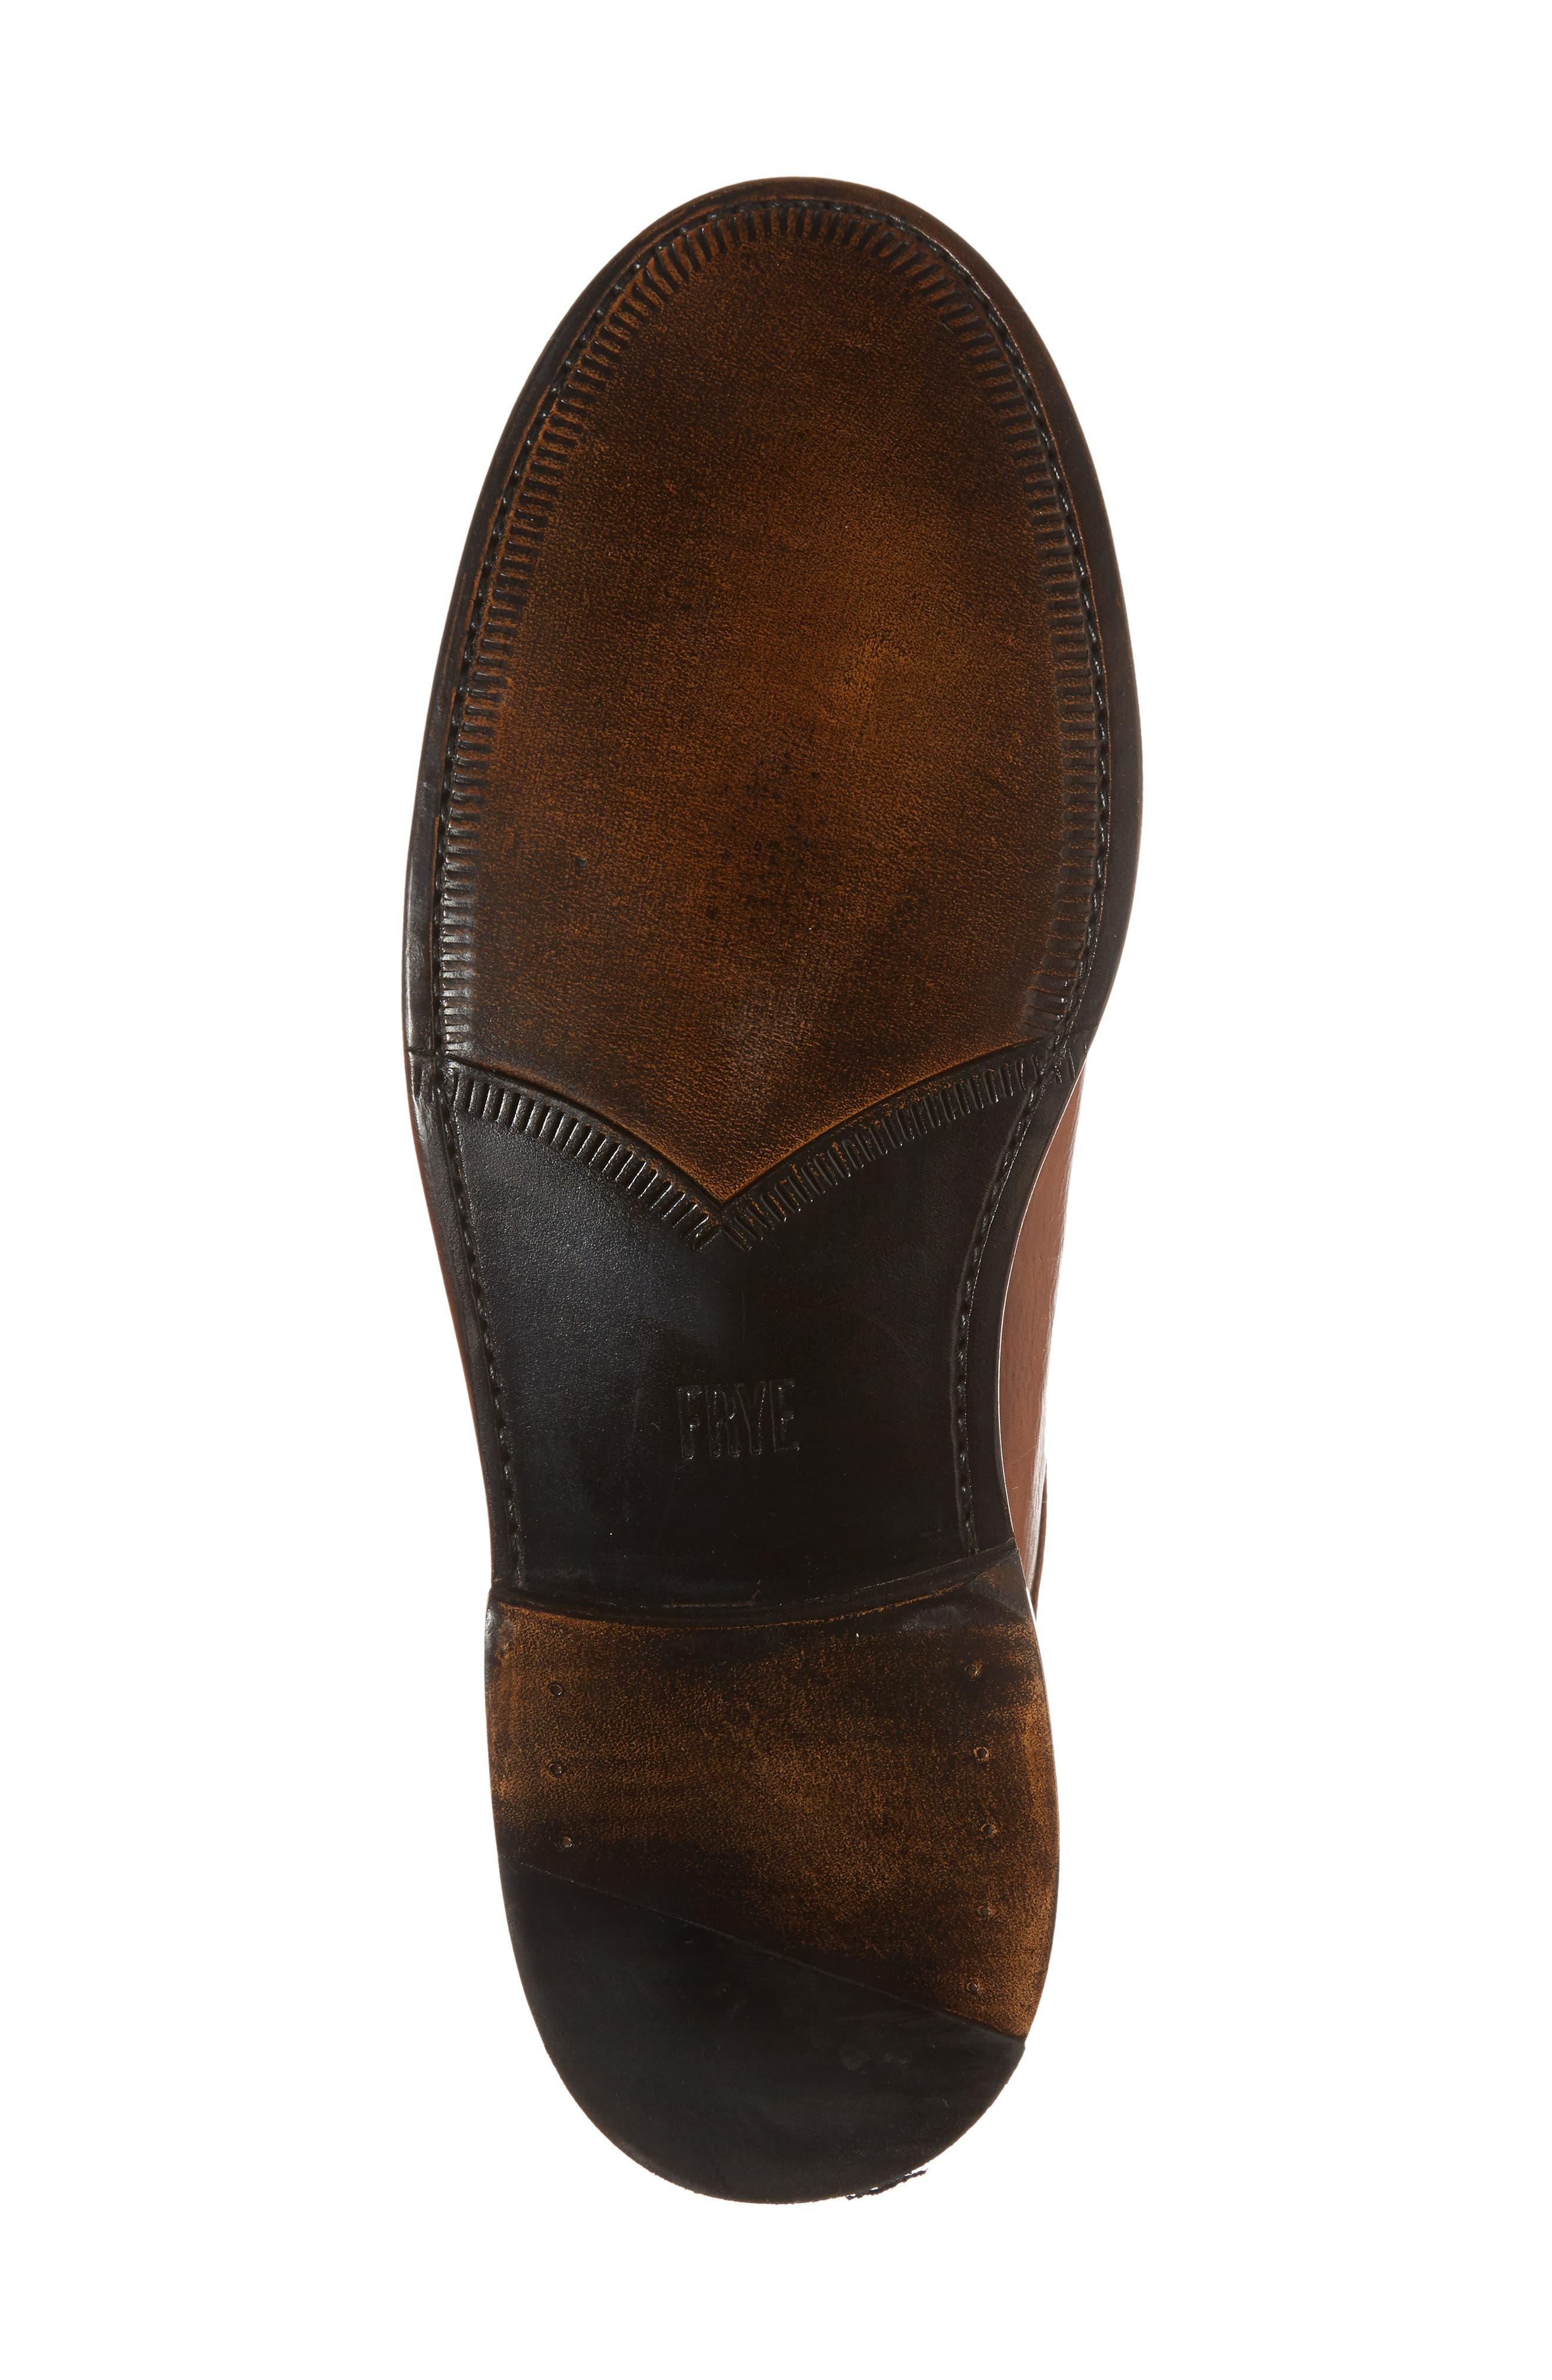 Jones Chelsea Boot,                             Alternate thumbnail 6, color,                             Caramel Leather